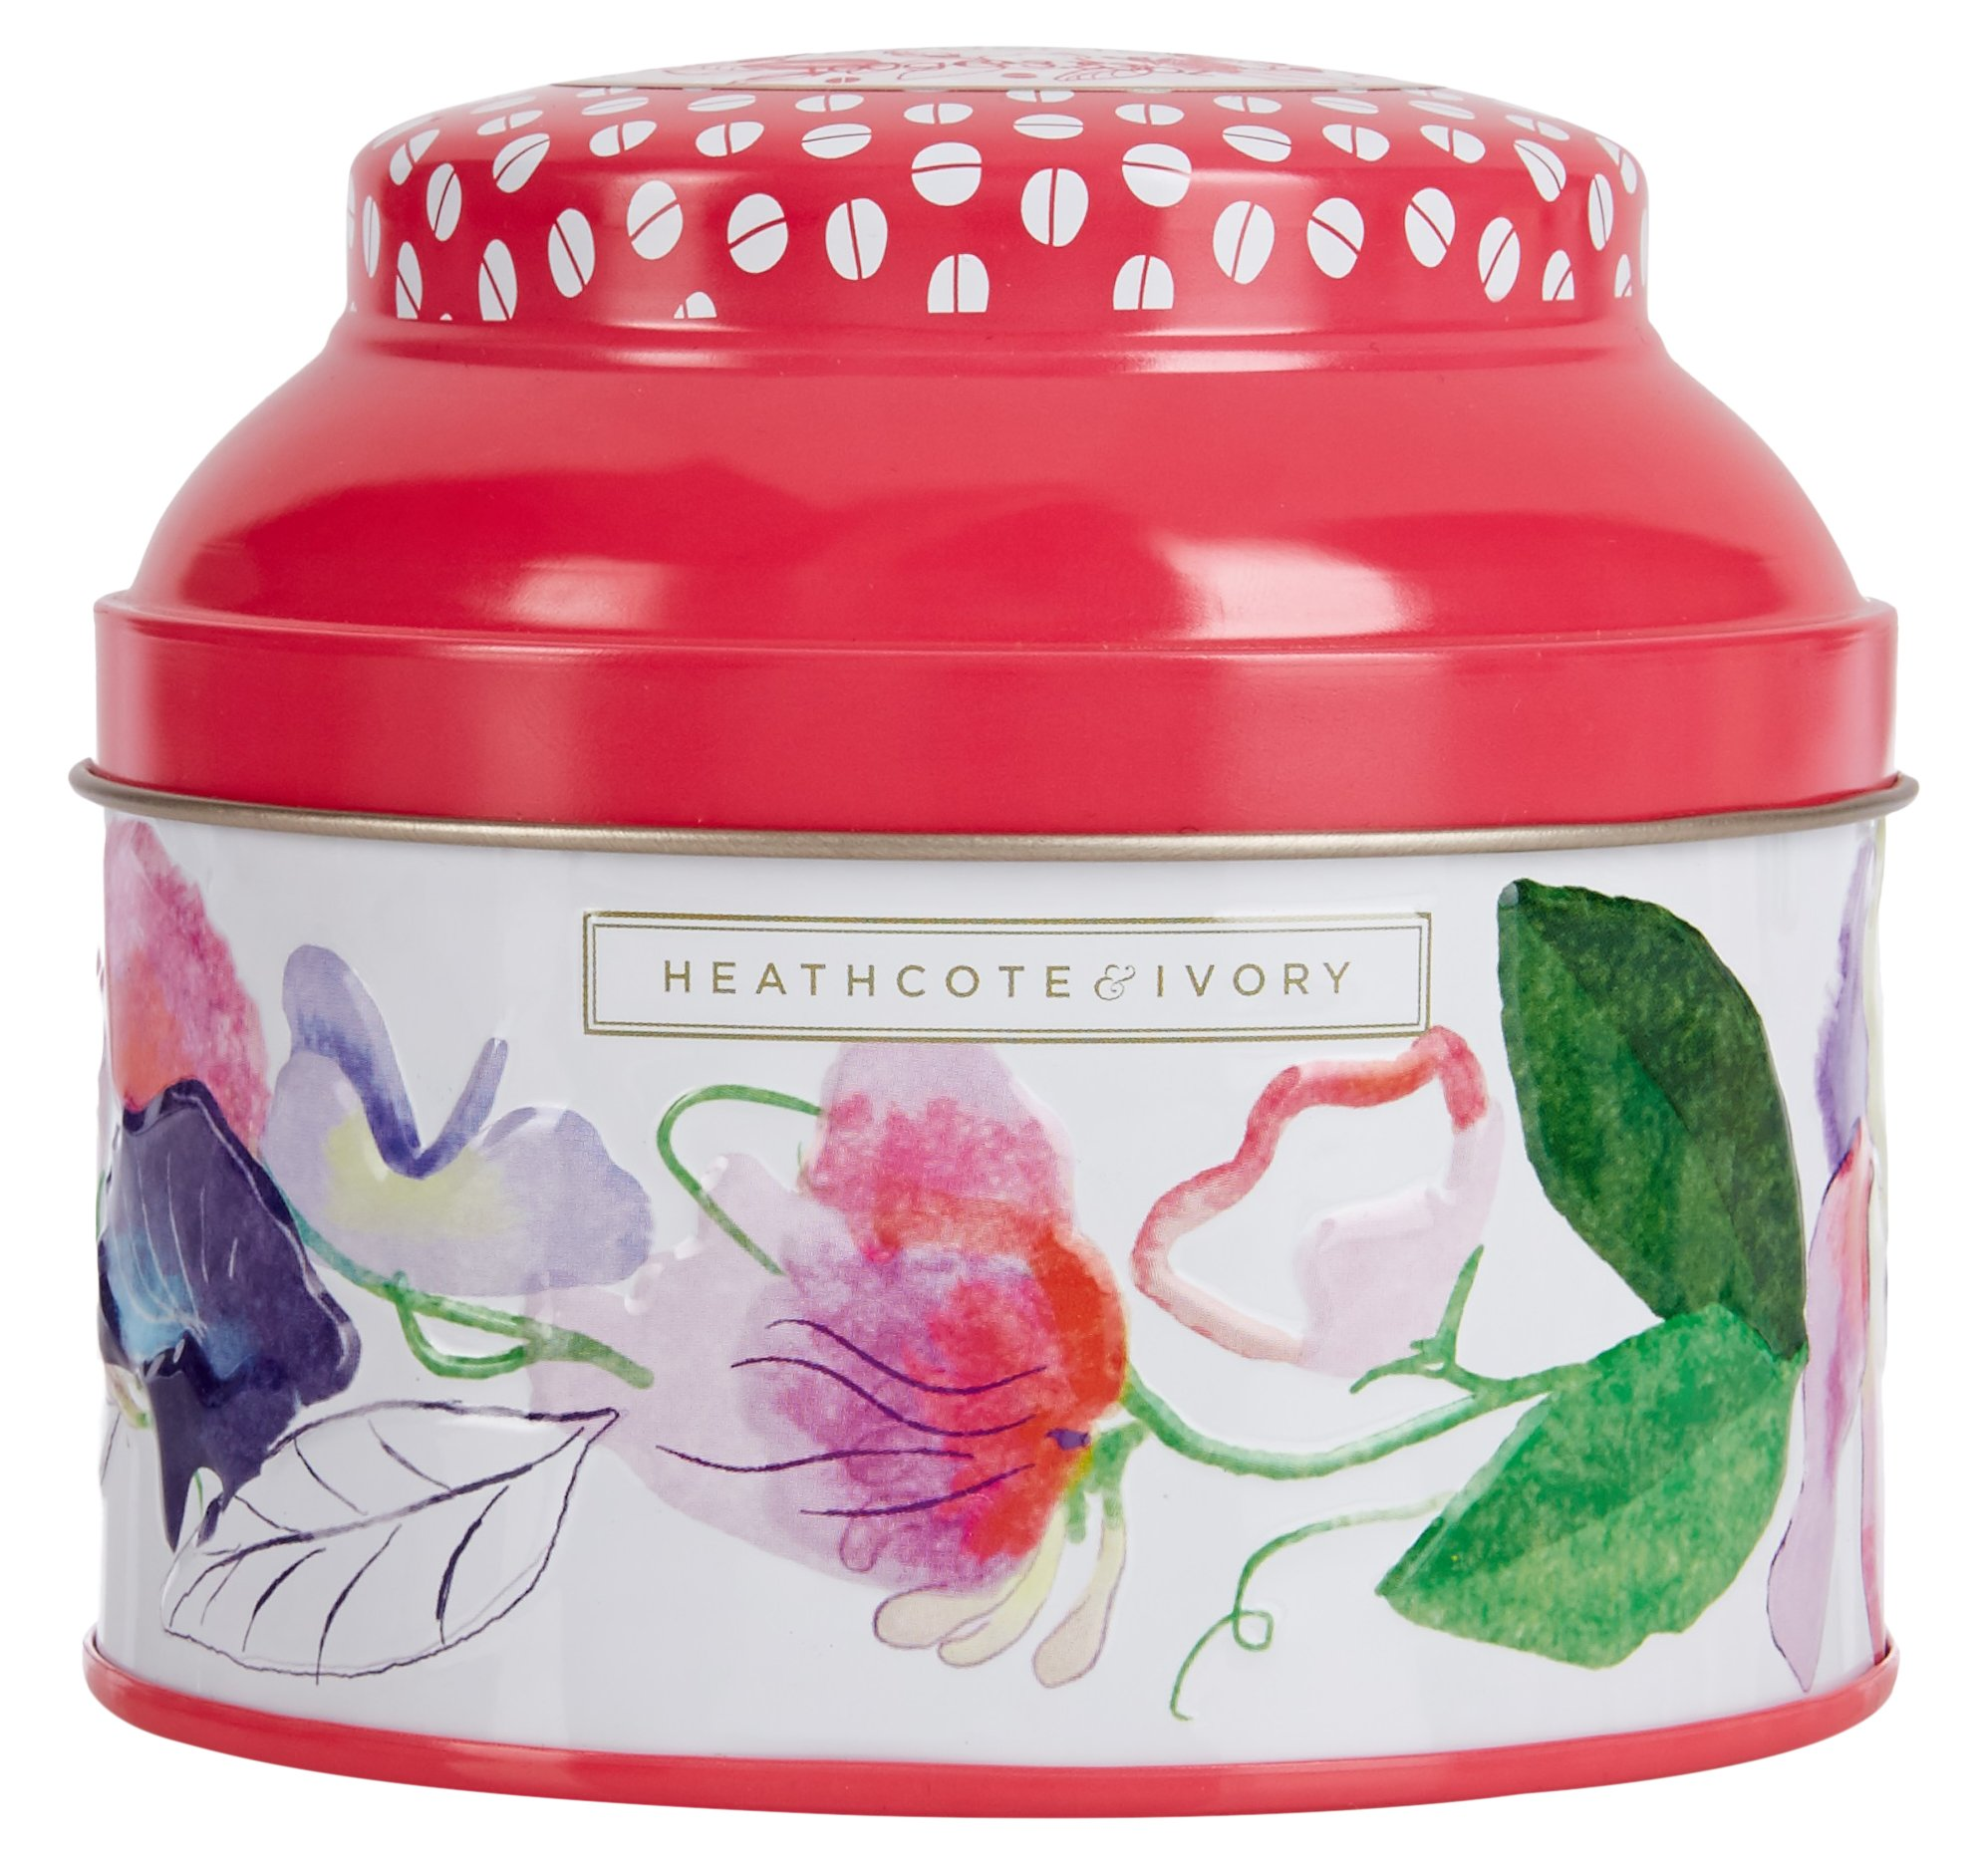 Heathcote & Ivory Sweet Pea & Honeysuckle Dusting Powder